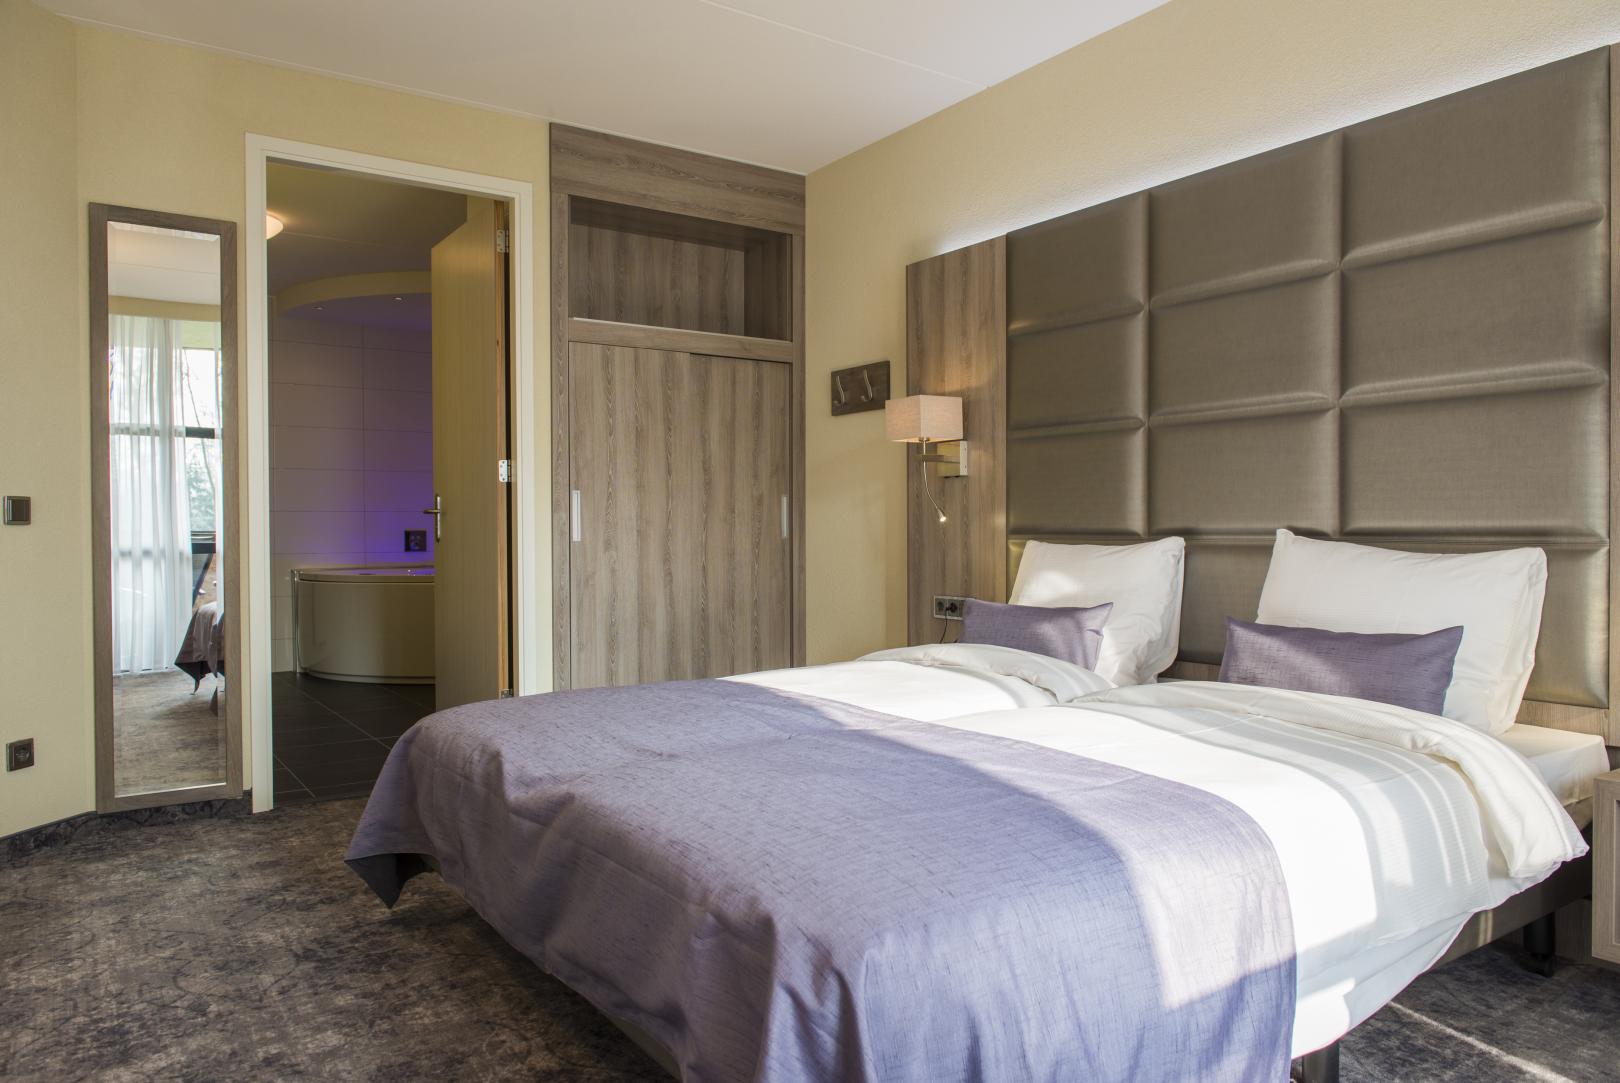 Marveld Tournament - Hotel Havezate Marveld - Bedroom